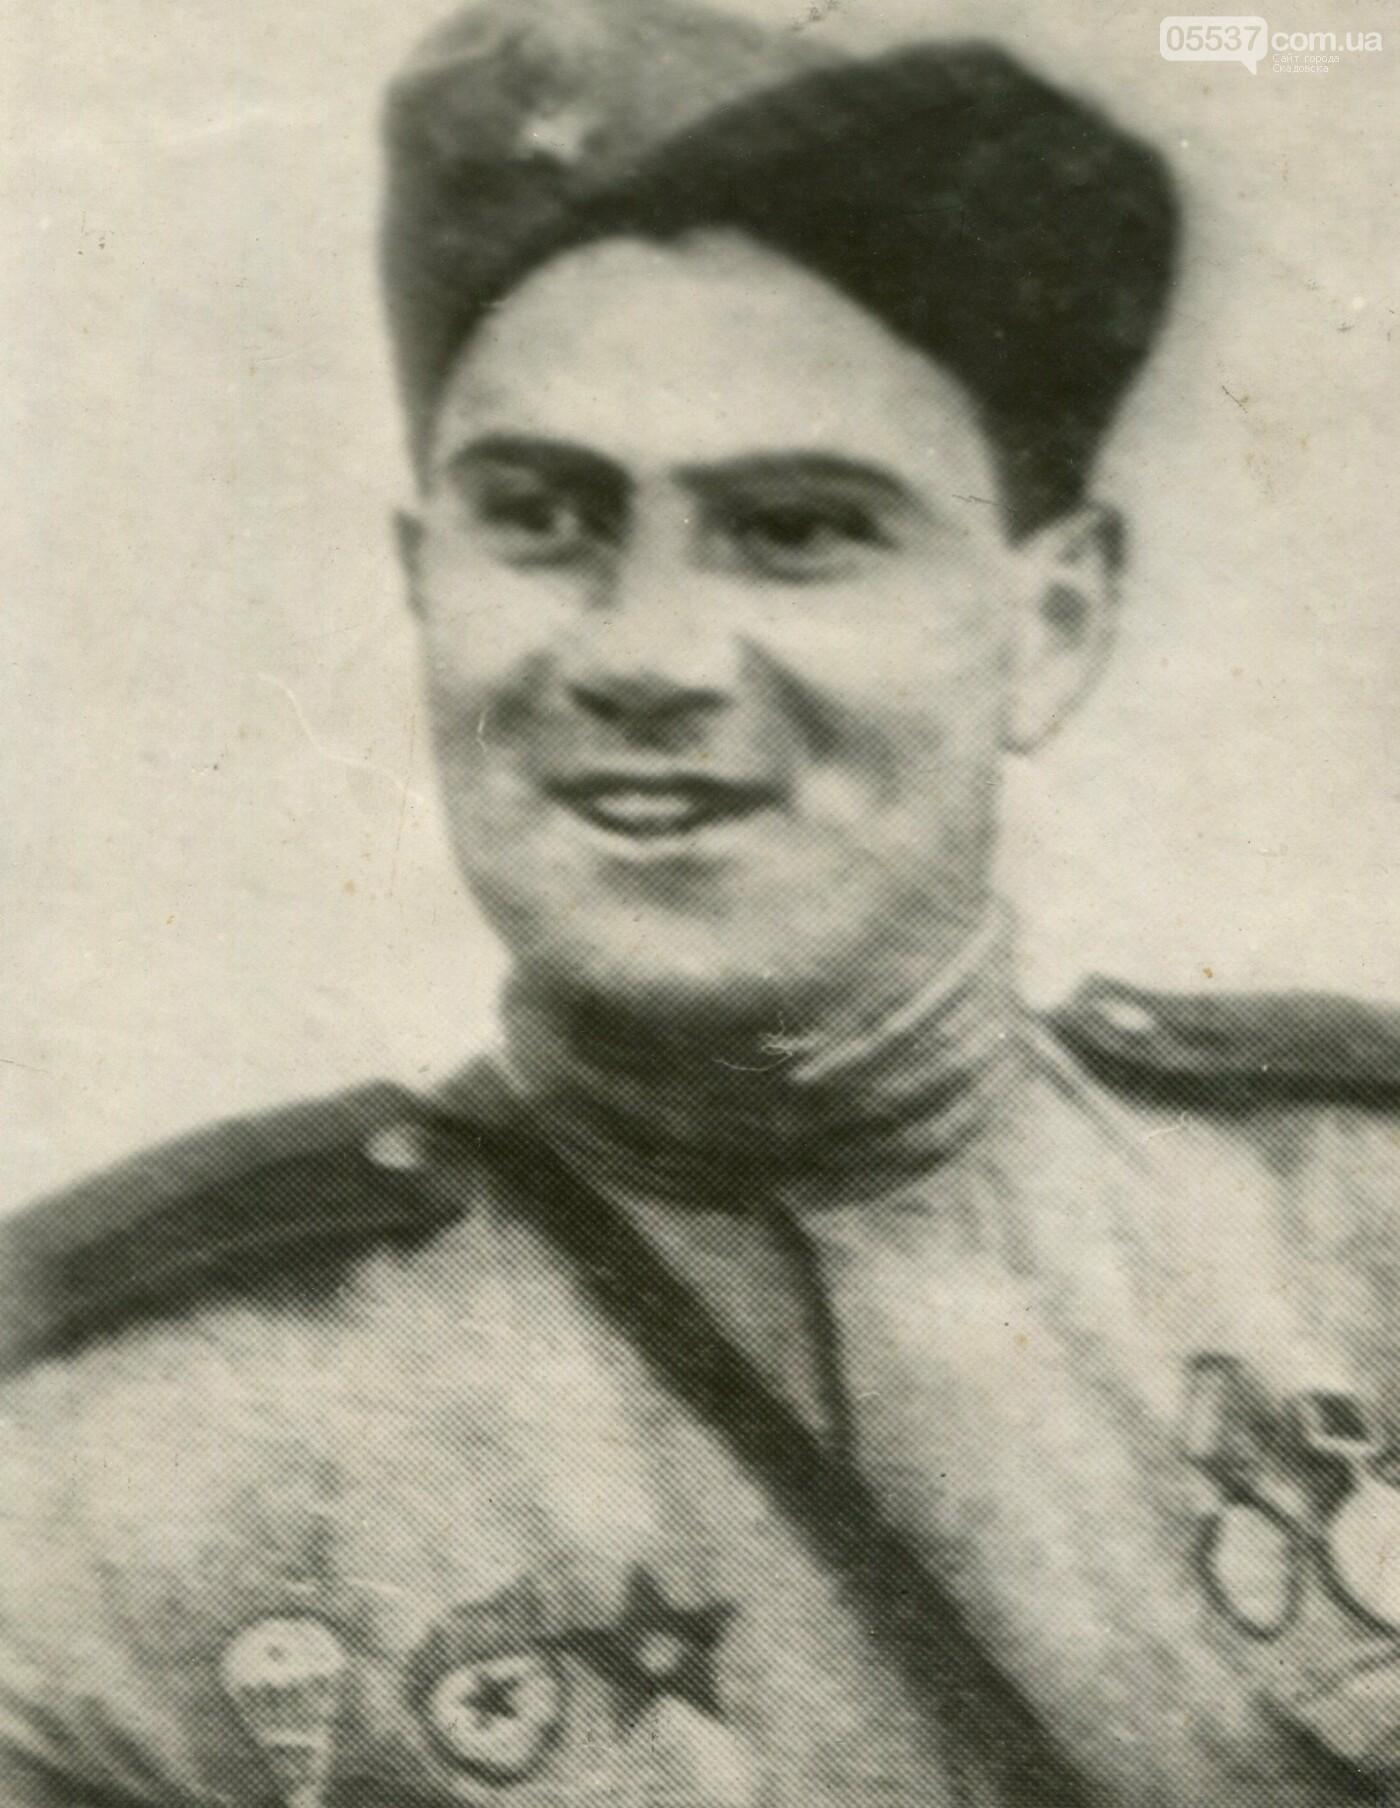 В Скадовском музее показали фото тех, кто освобождал город от нацистов, фото-1